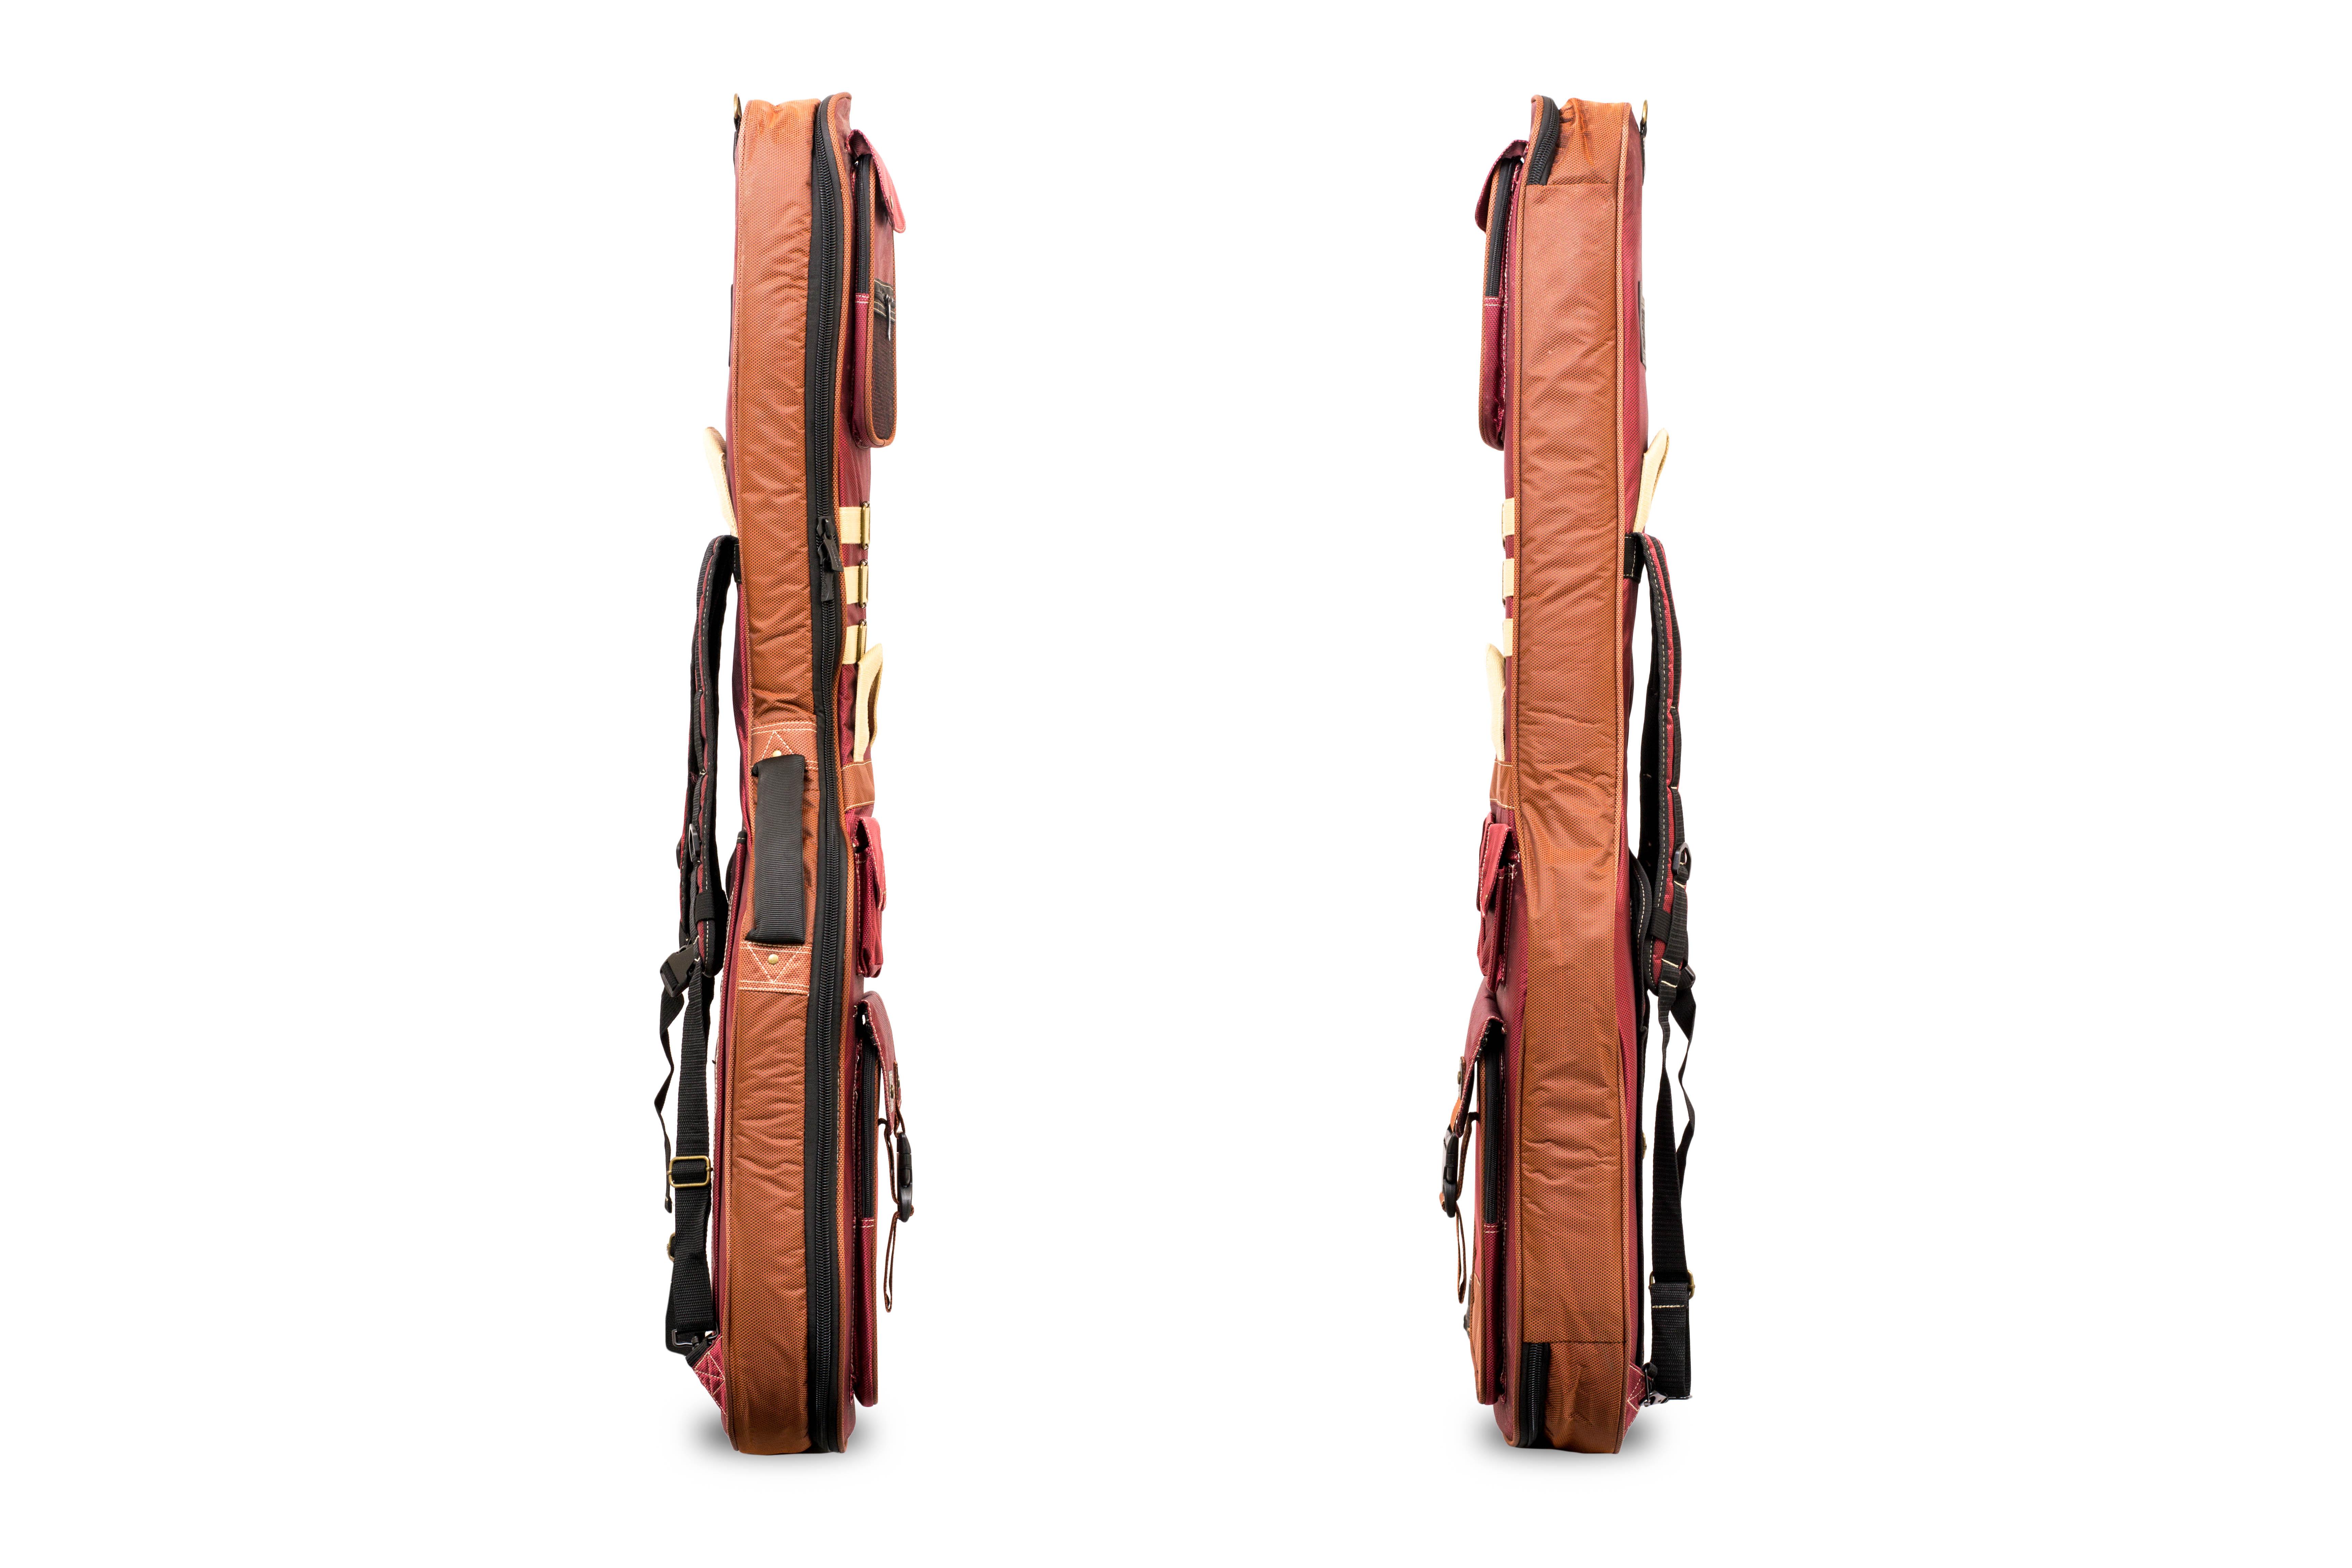 Davis Musical Instruments-HG600E_2